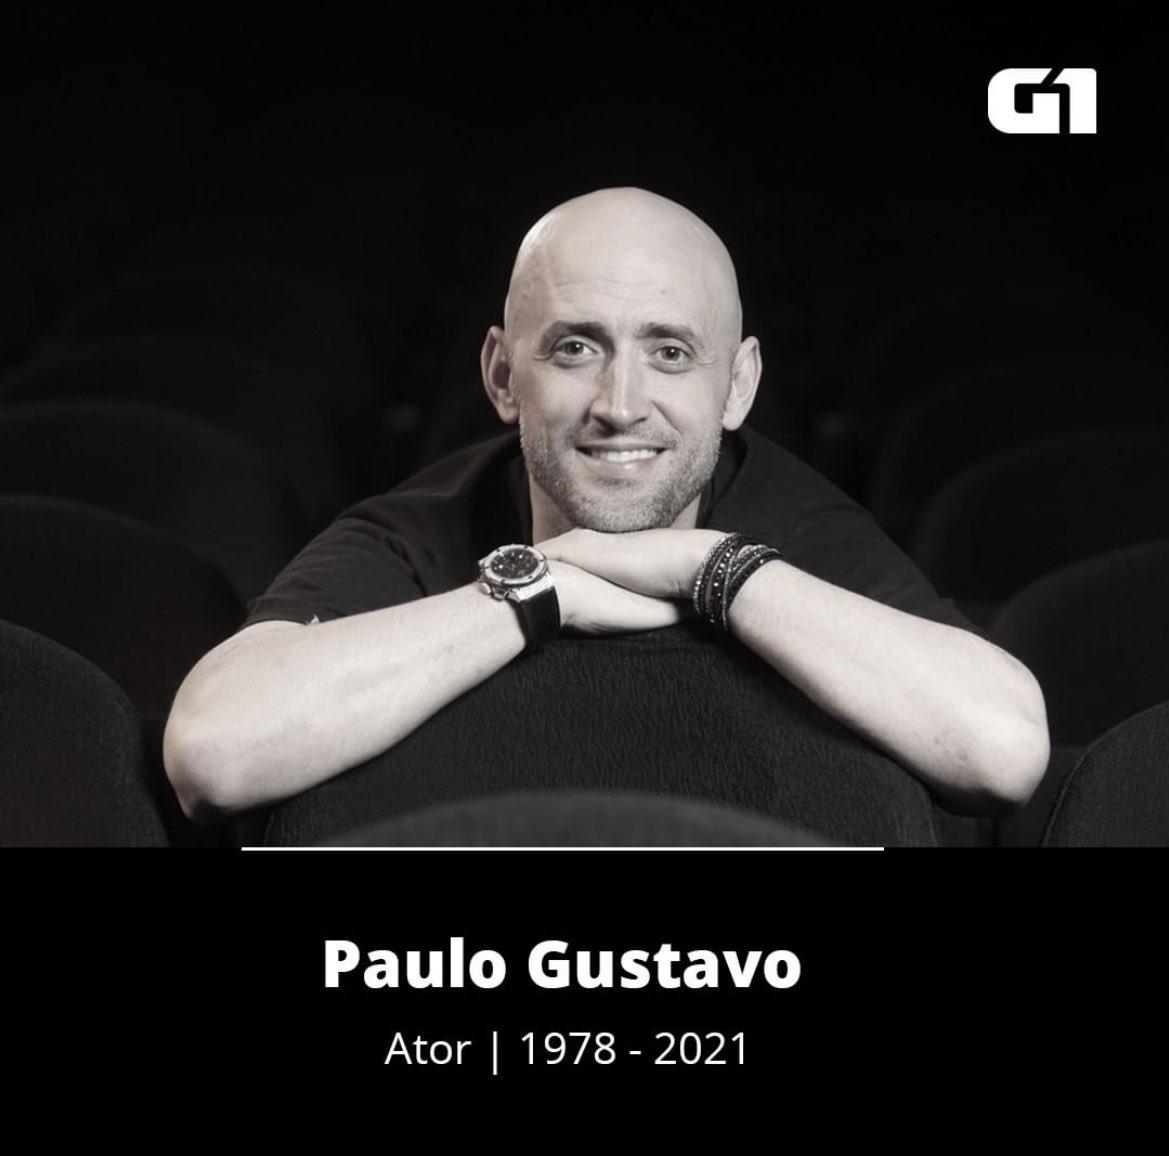 Rip @PauloGustavo31 💔 https://t.co/66WB5jLh7B